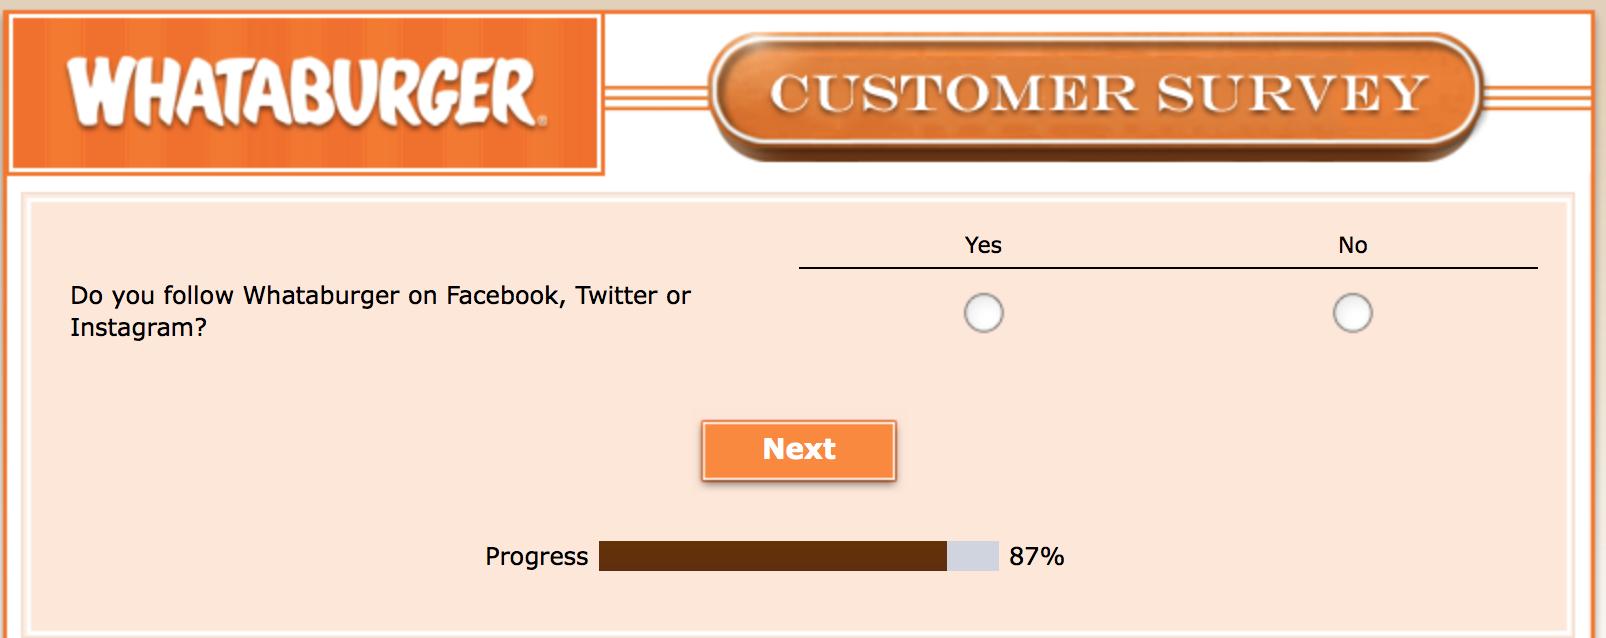 Whataburger Survey 30